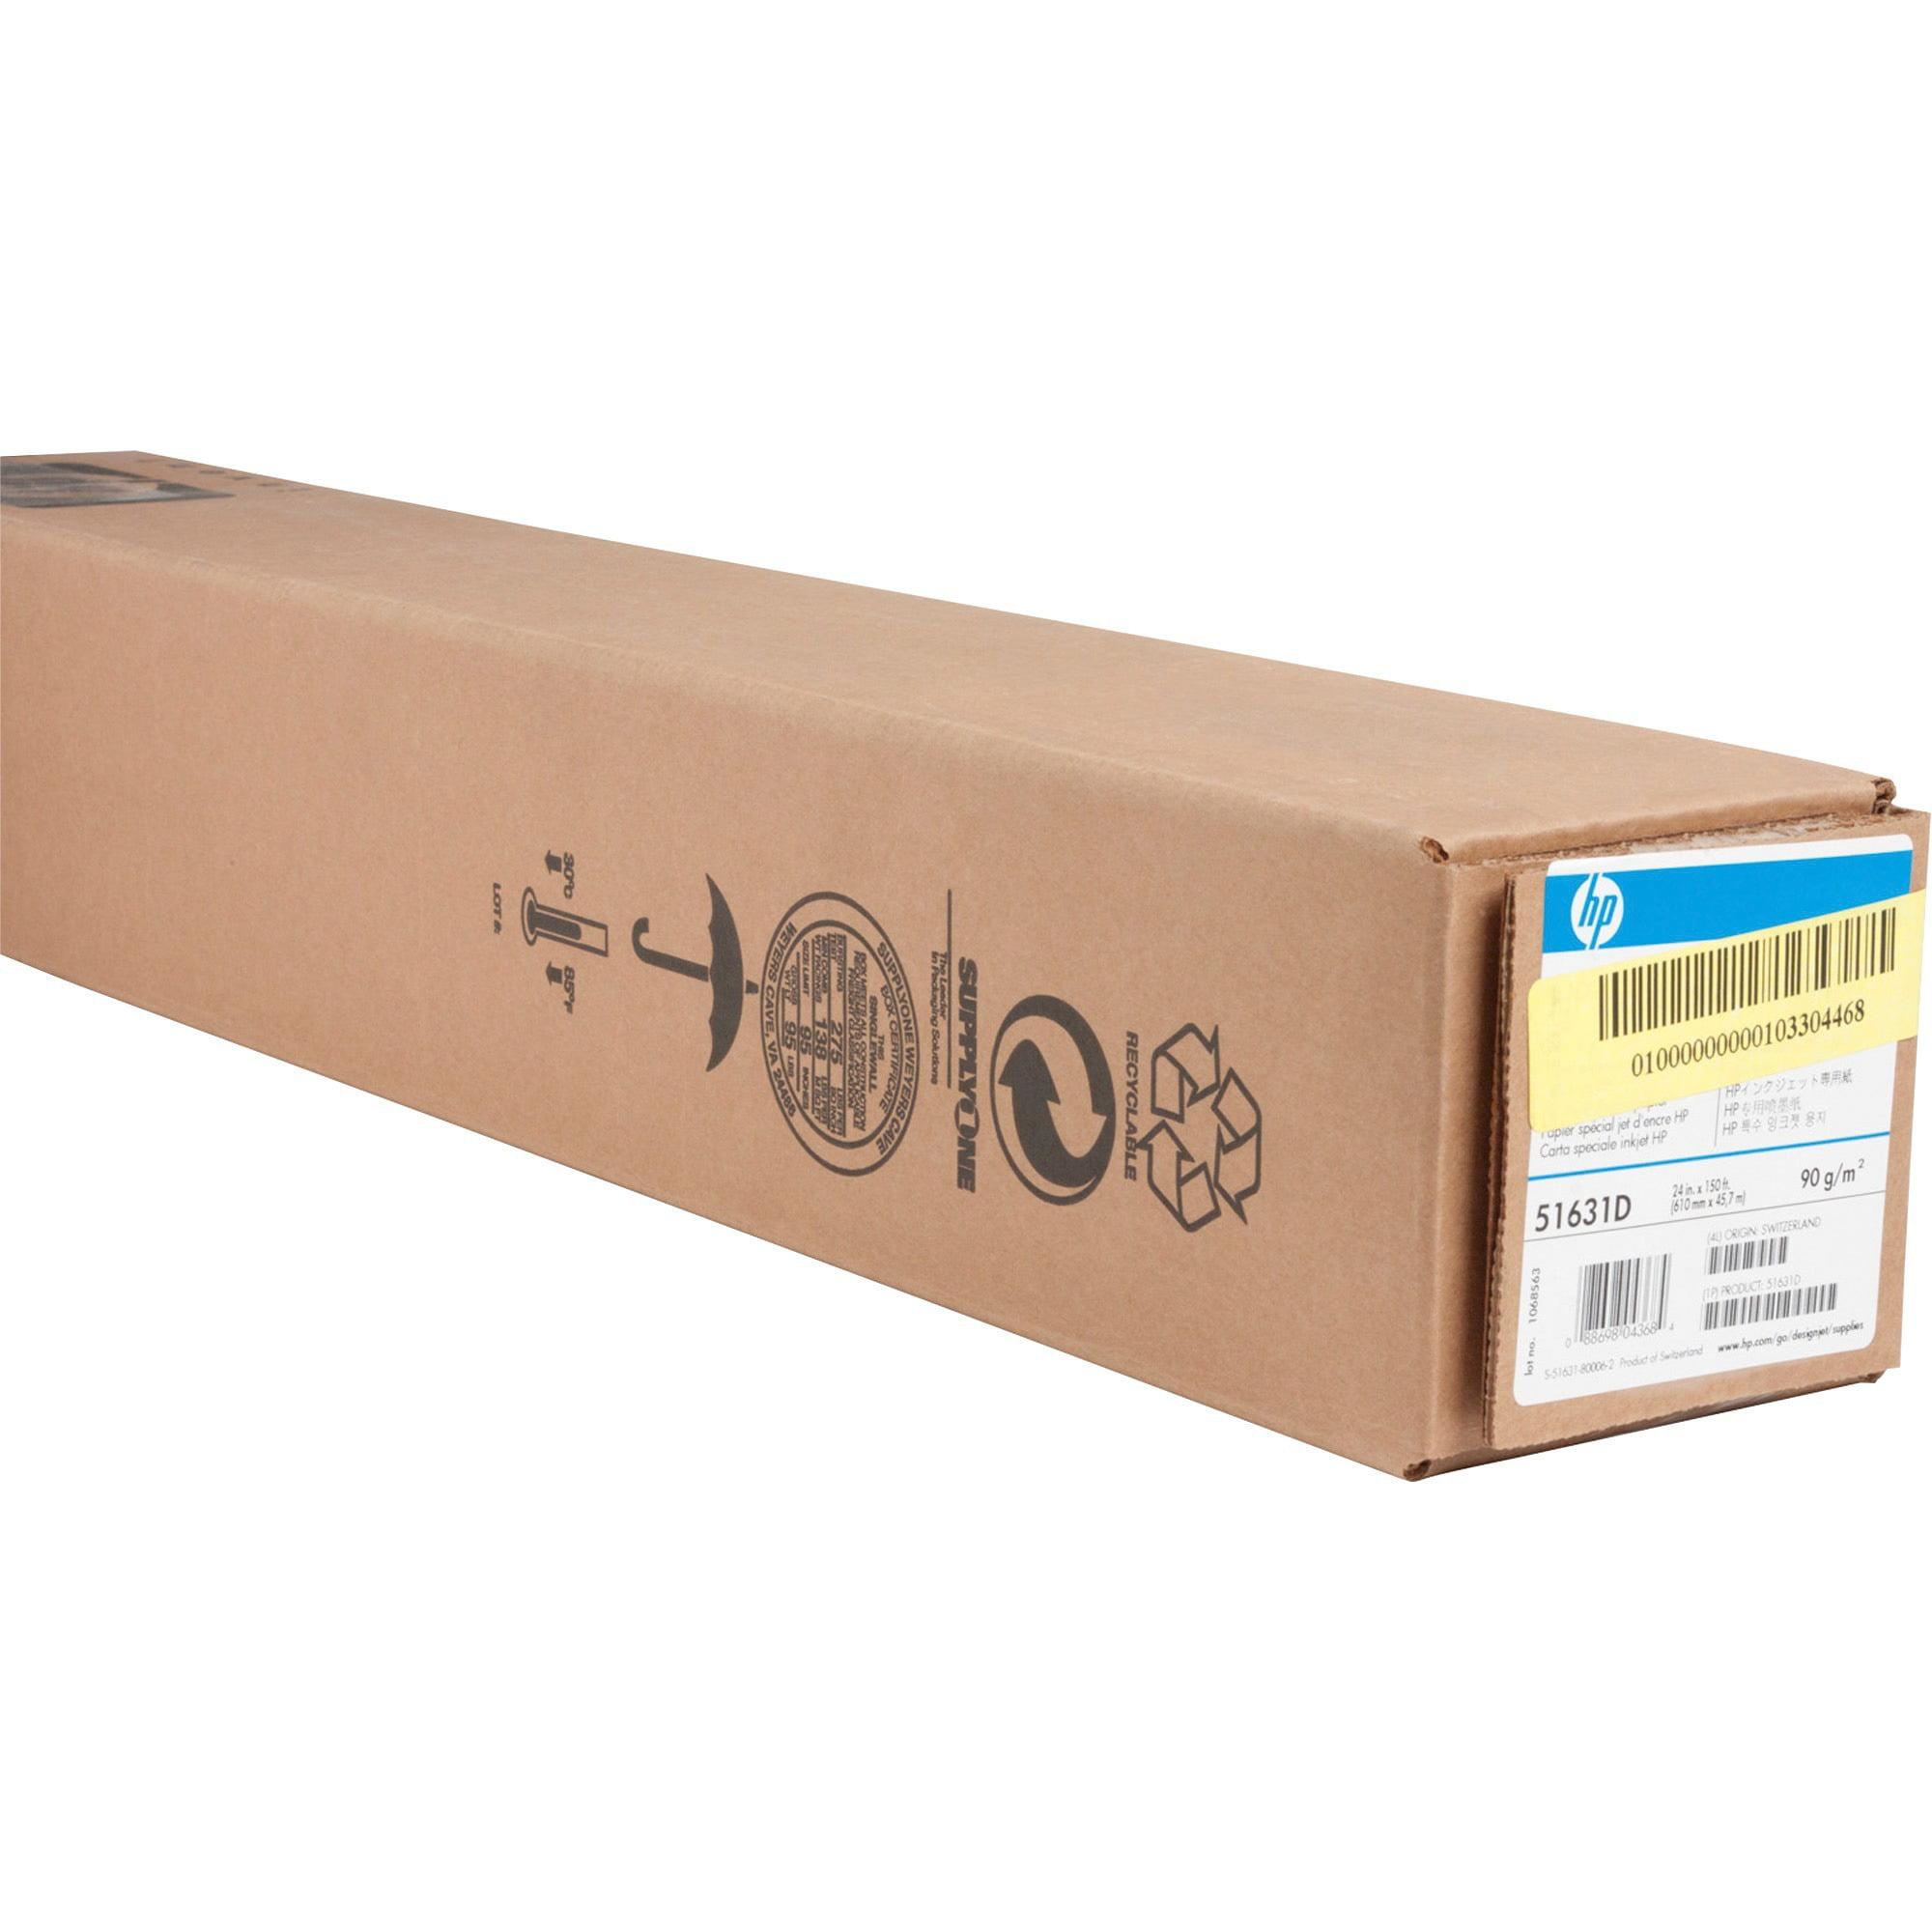 HP, HEW51631D, Wide Format Special Inkjet Technical Paper, 1 Roll, Glossy